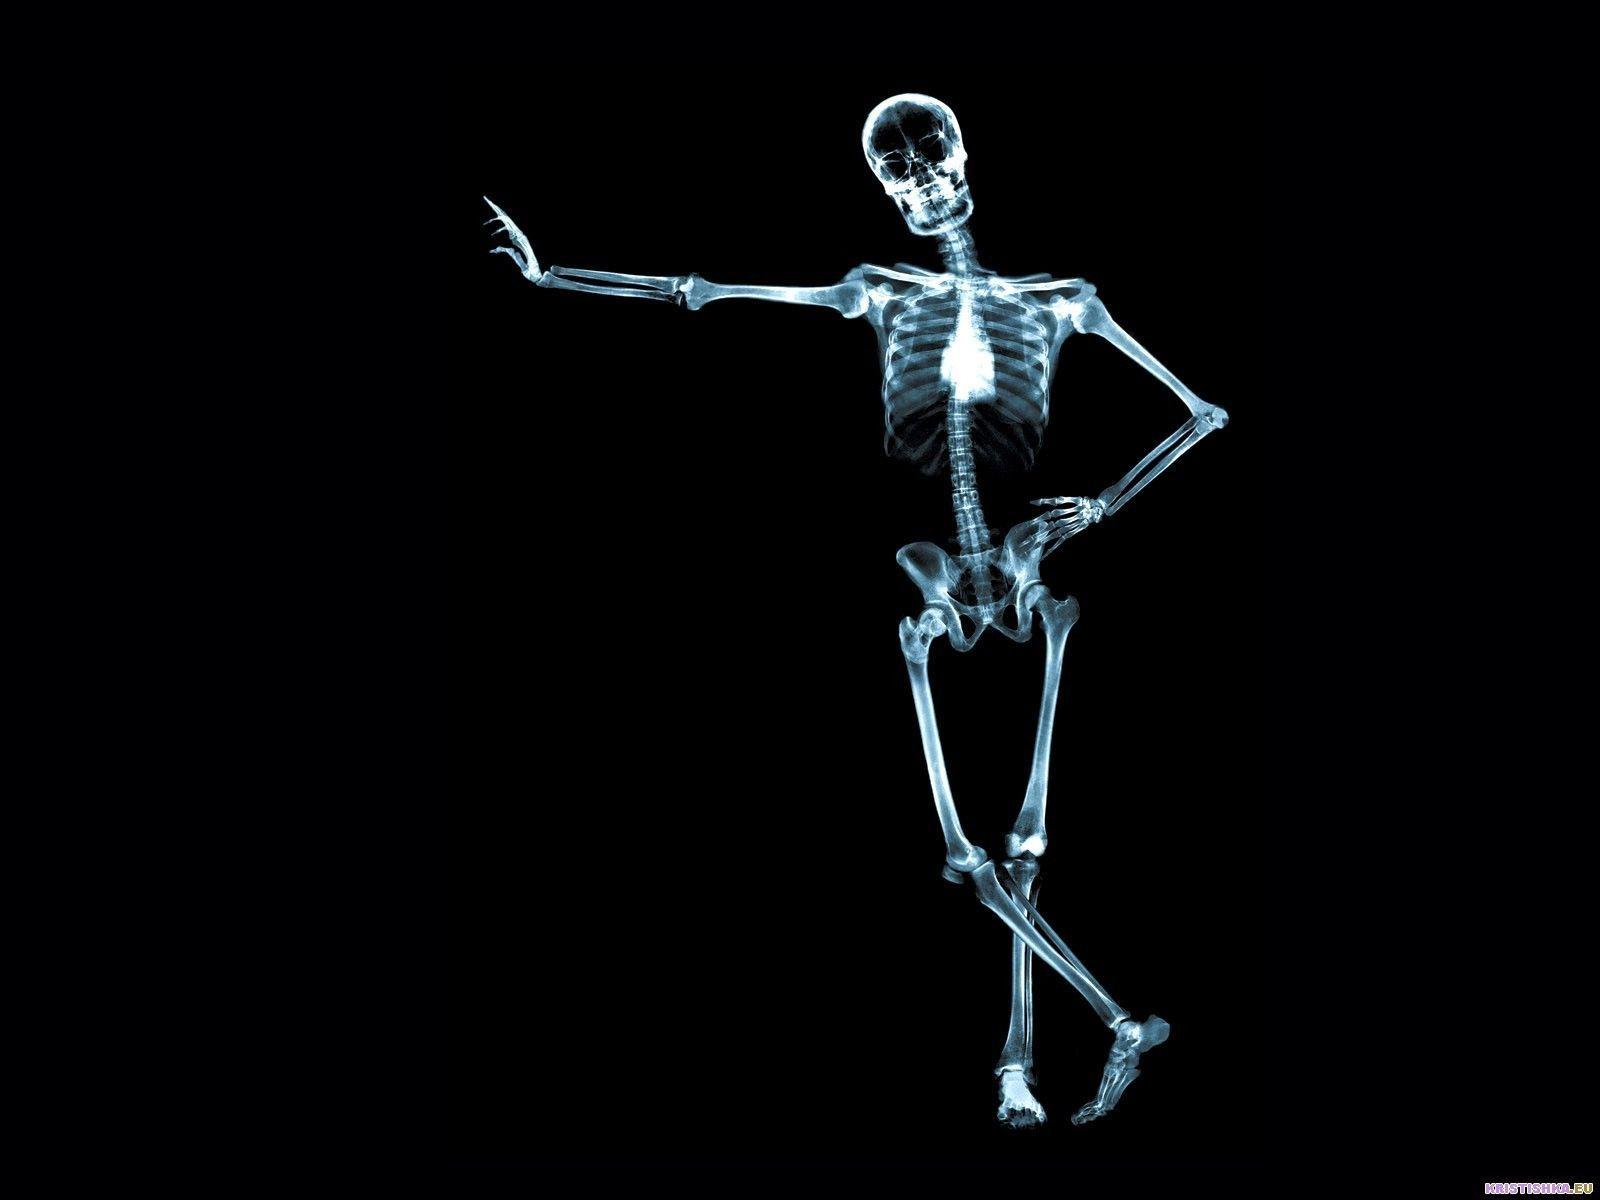 Artistic Anatomy Wallpaper More Information 16801050 Anatomy